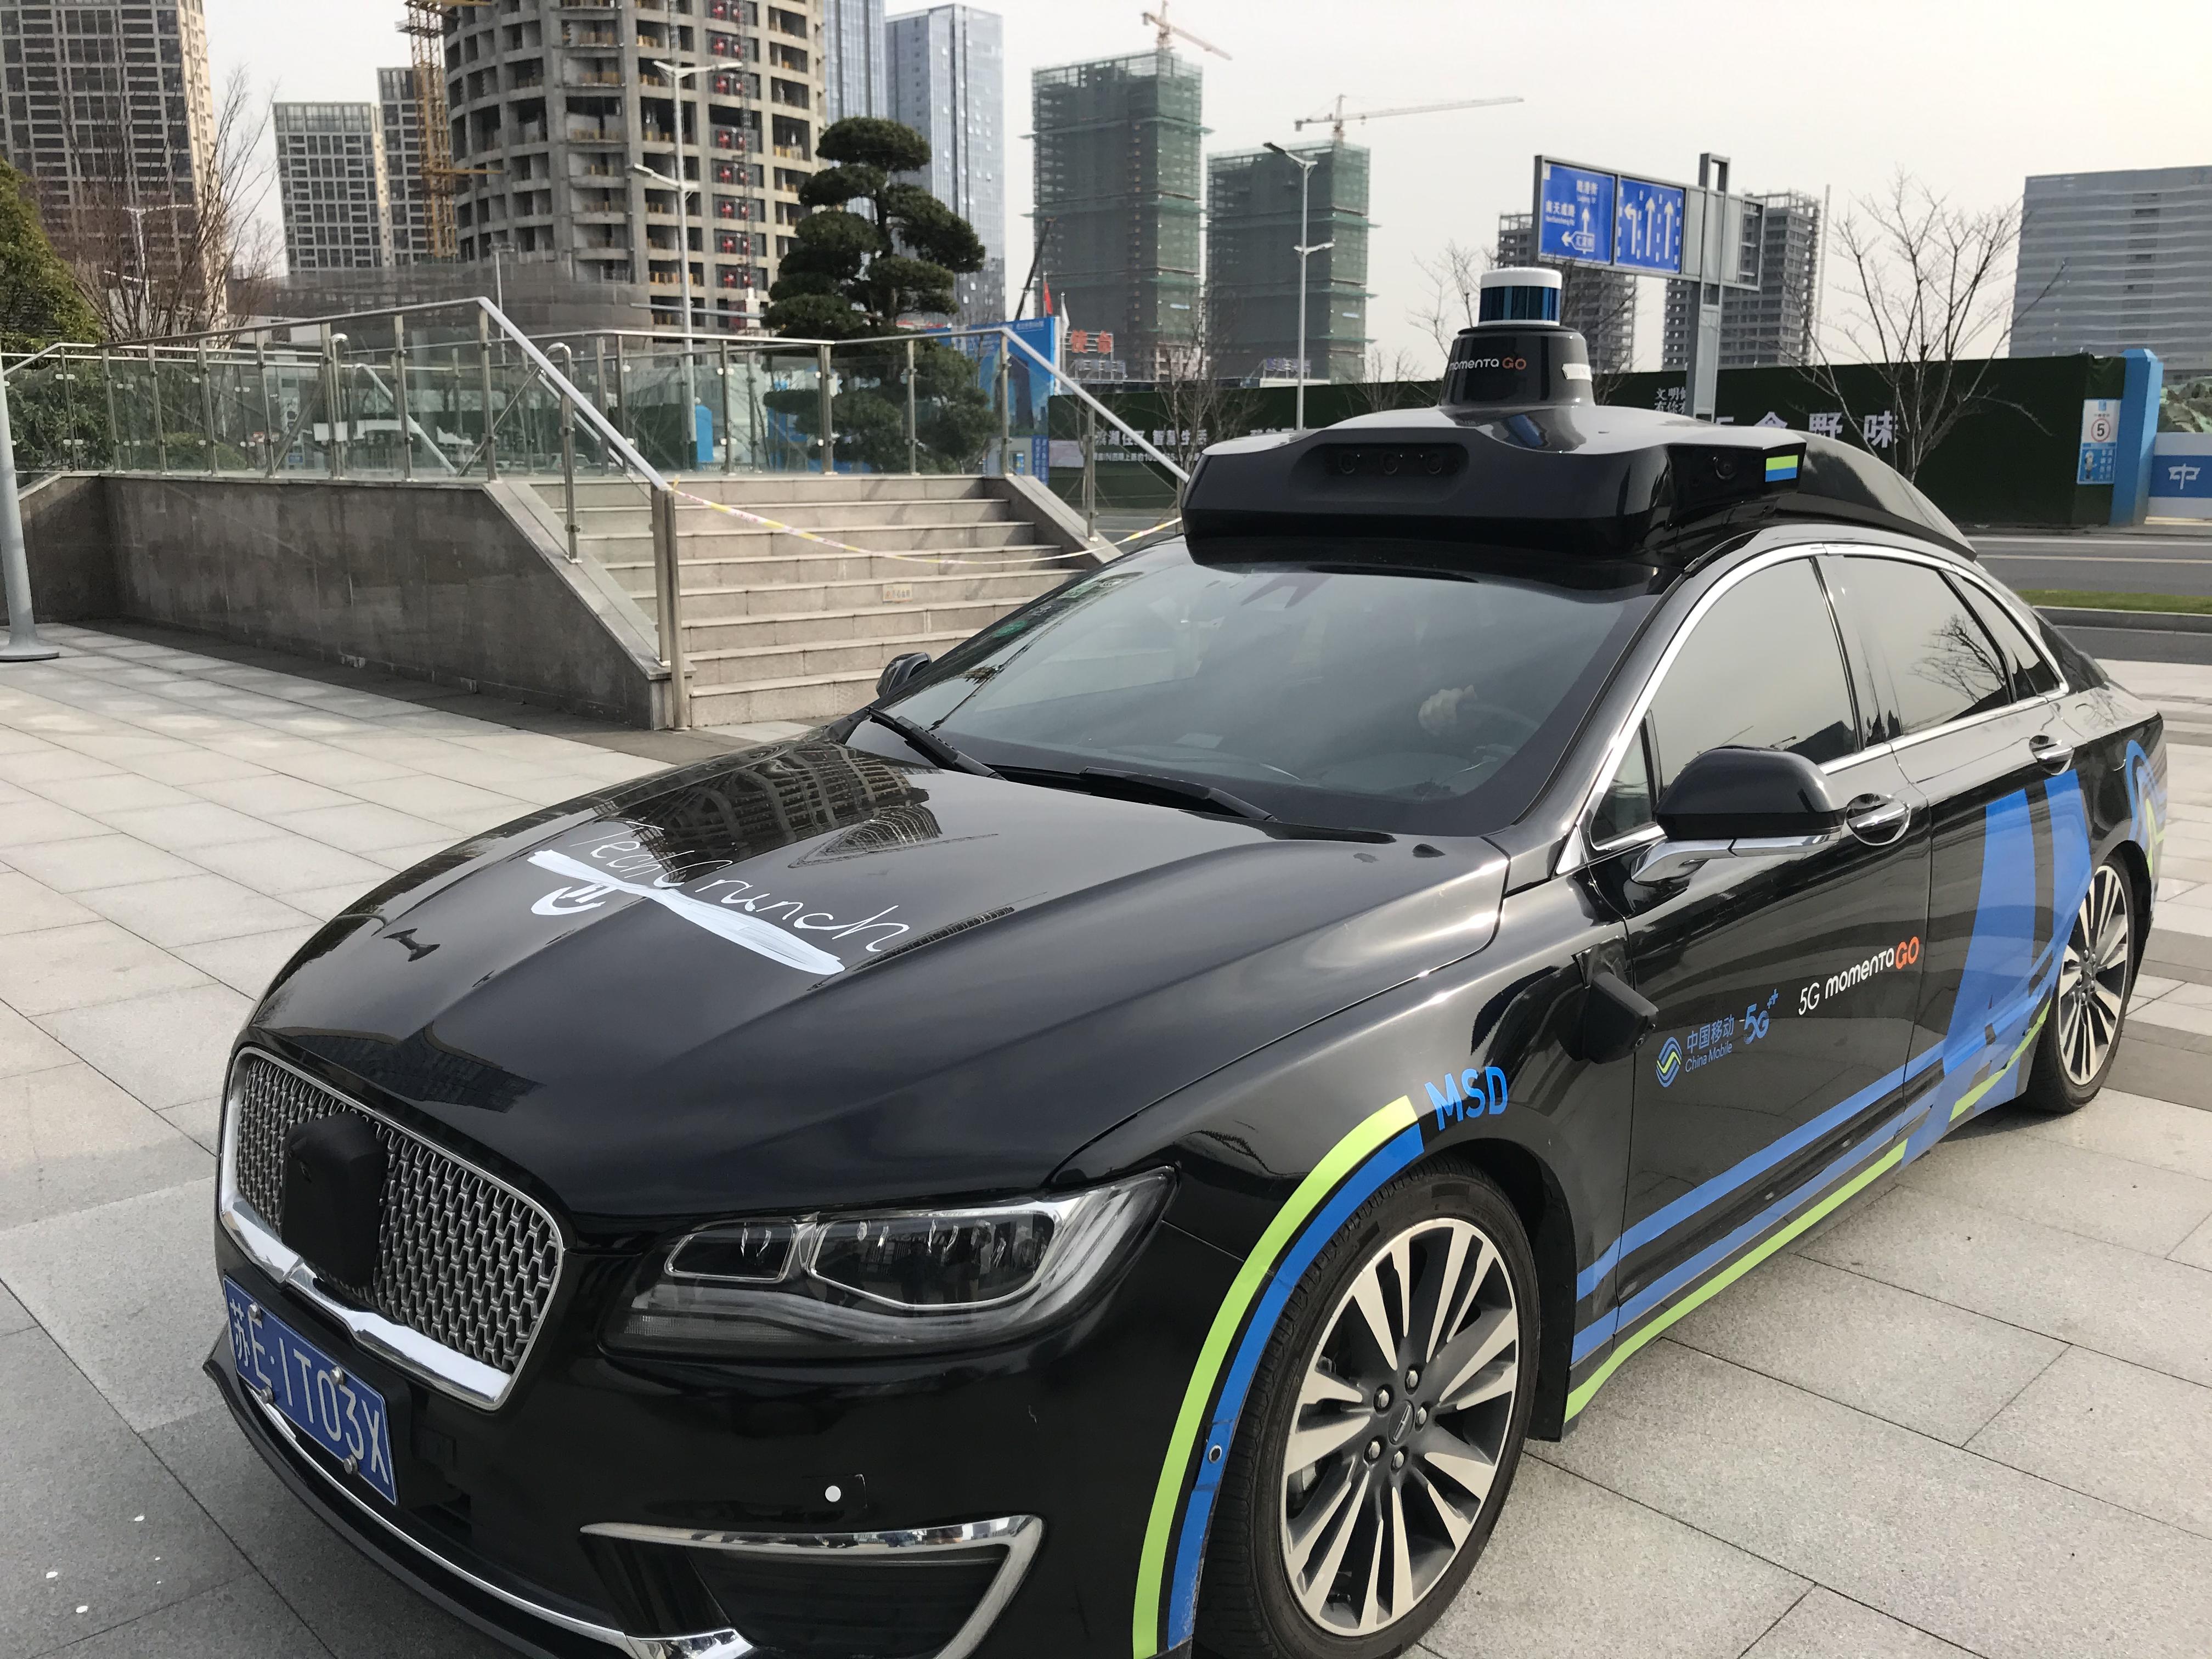 Betting on China's driverless future, Toyota, Bosch, Daimler jump on board Momenta's 0M round